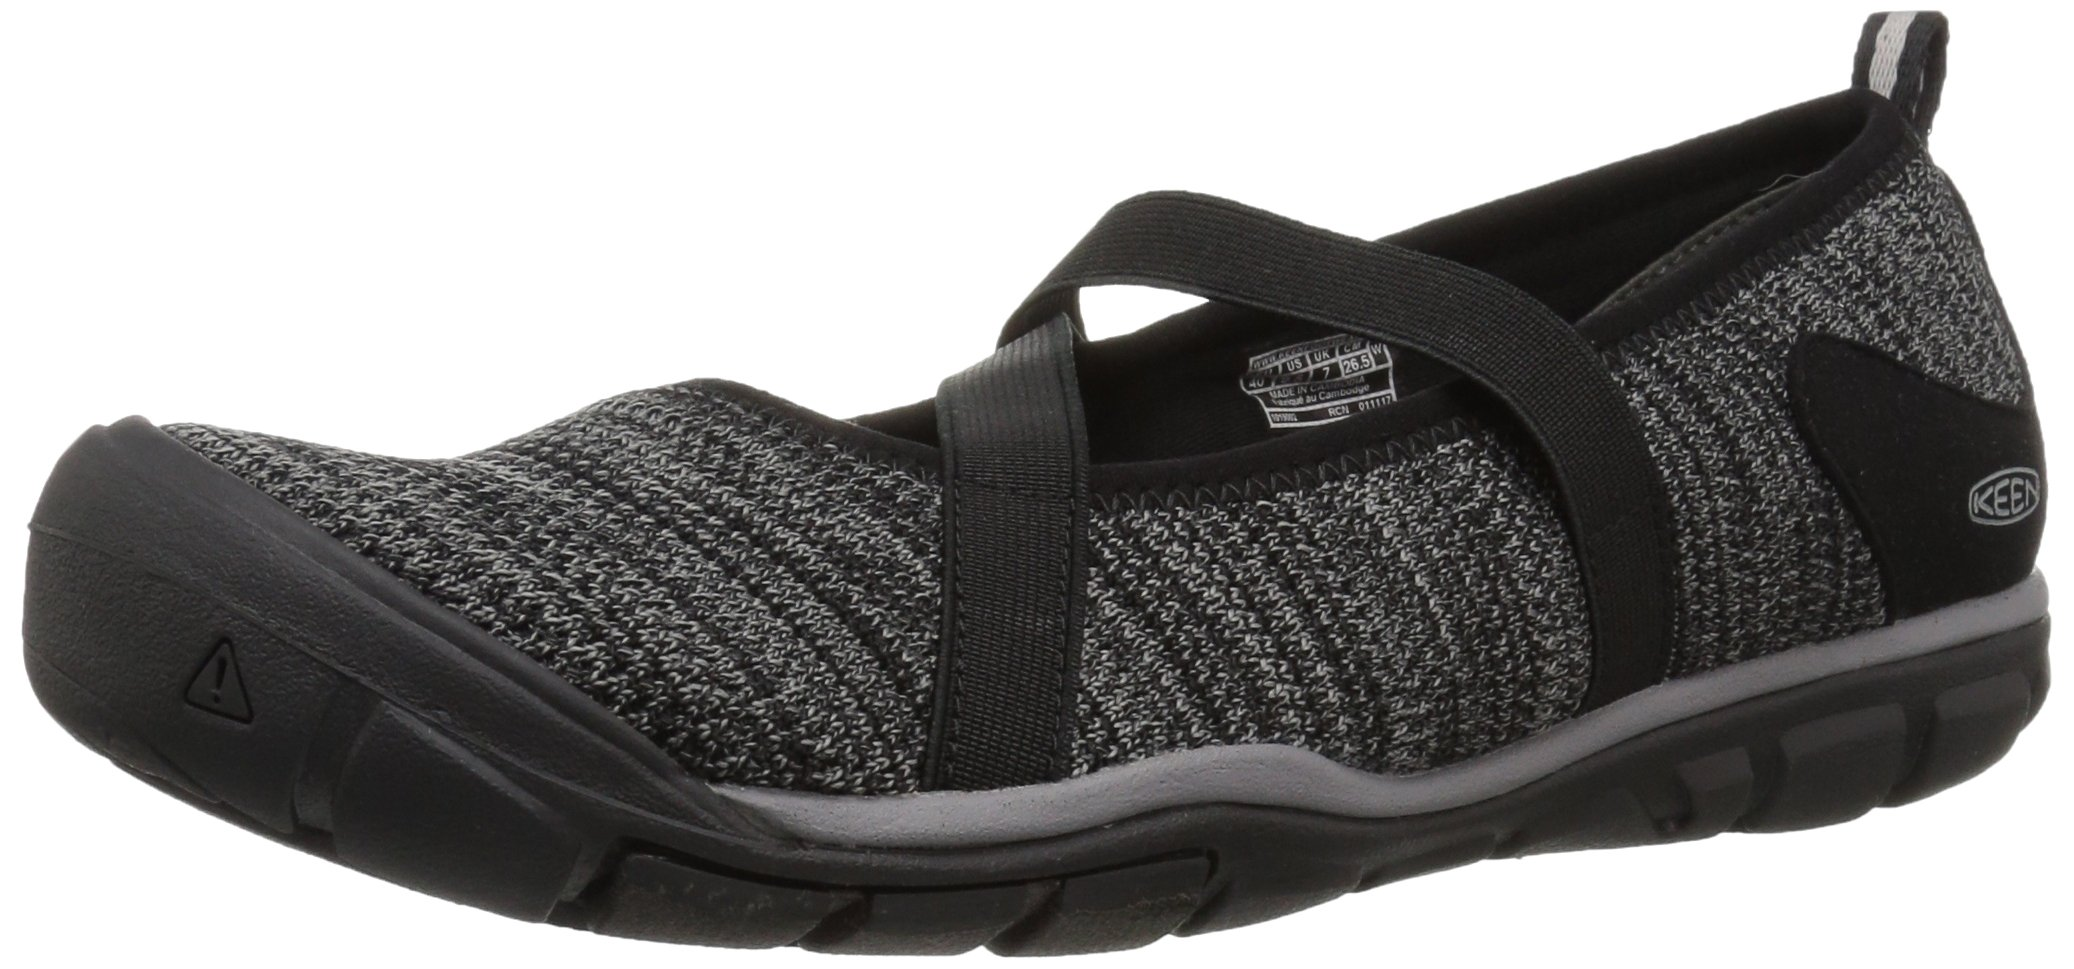 KEEN Women's Hush Knit MJ-W Hiking Shoe, Black/Gargoyle, 7 M US